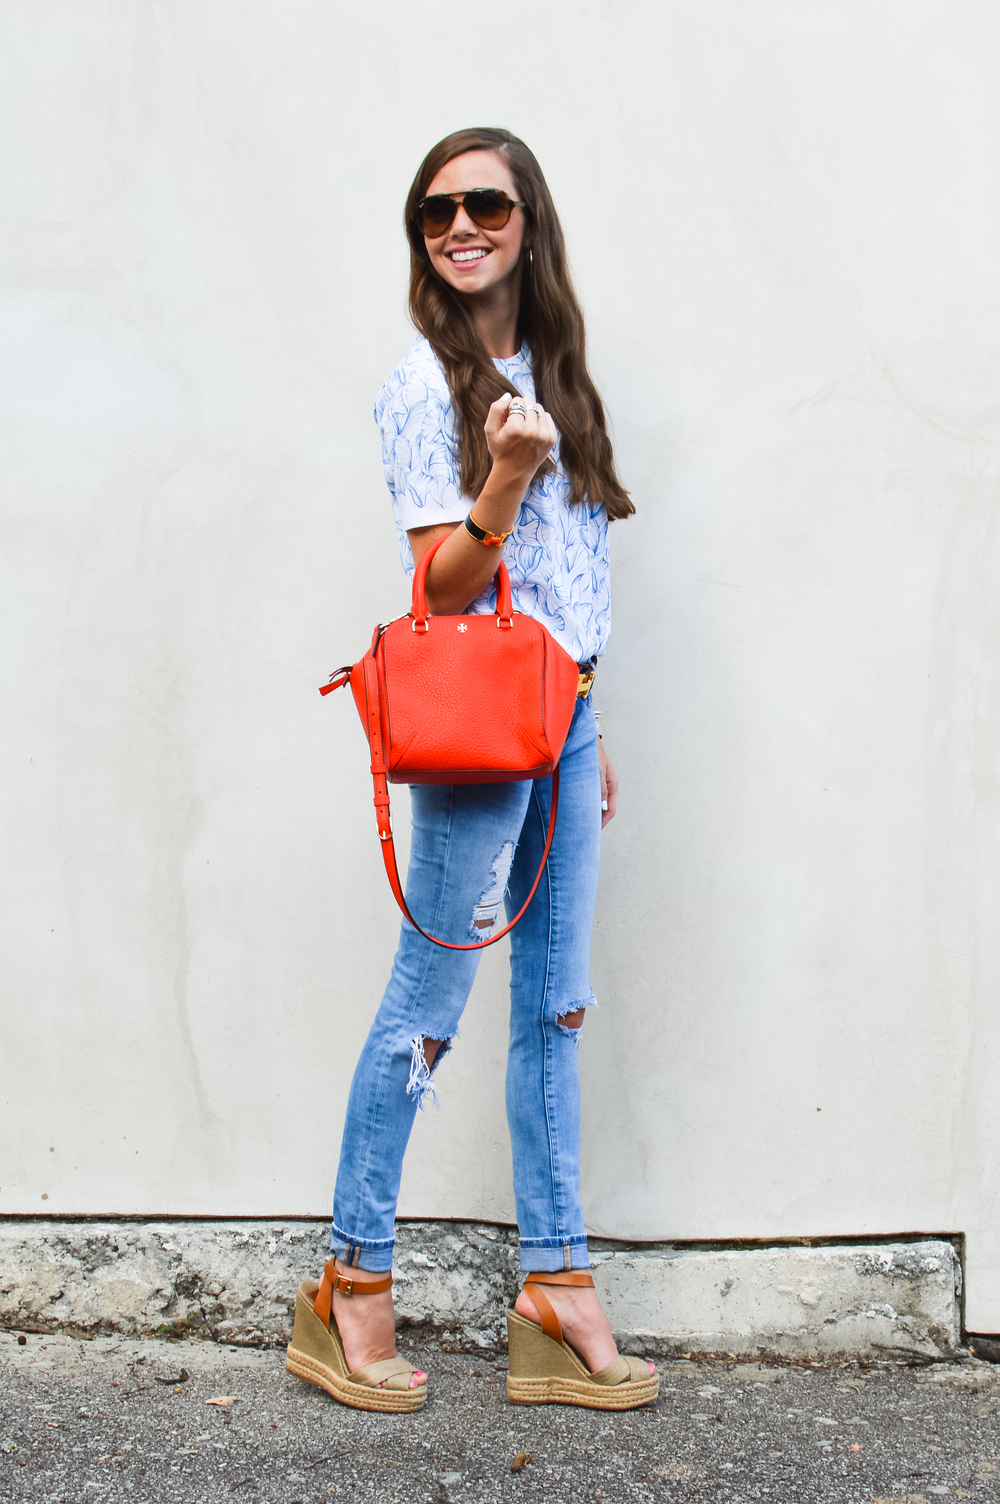 lcb_style_fashion_blogger_tory burch top (20 of 29).jpg